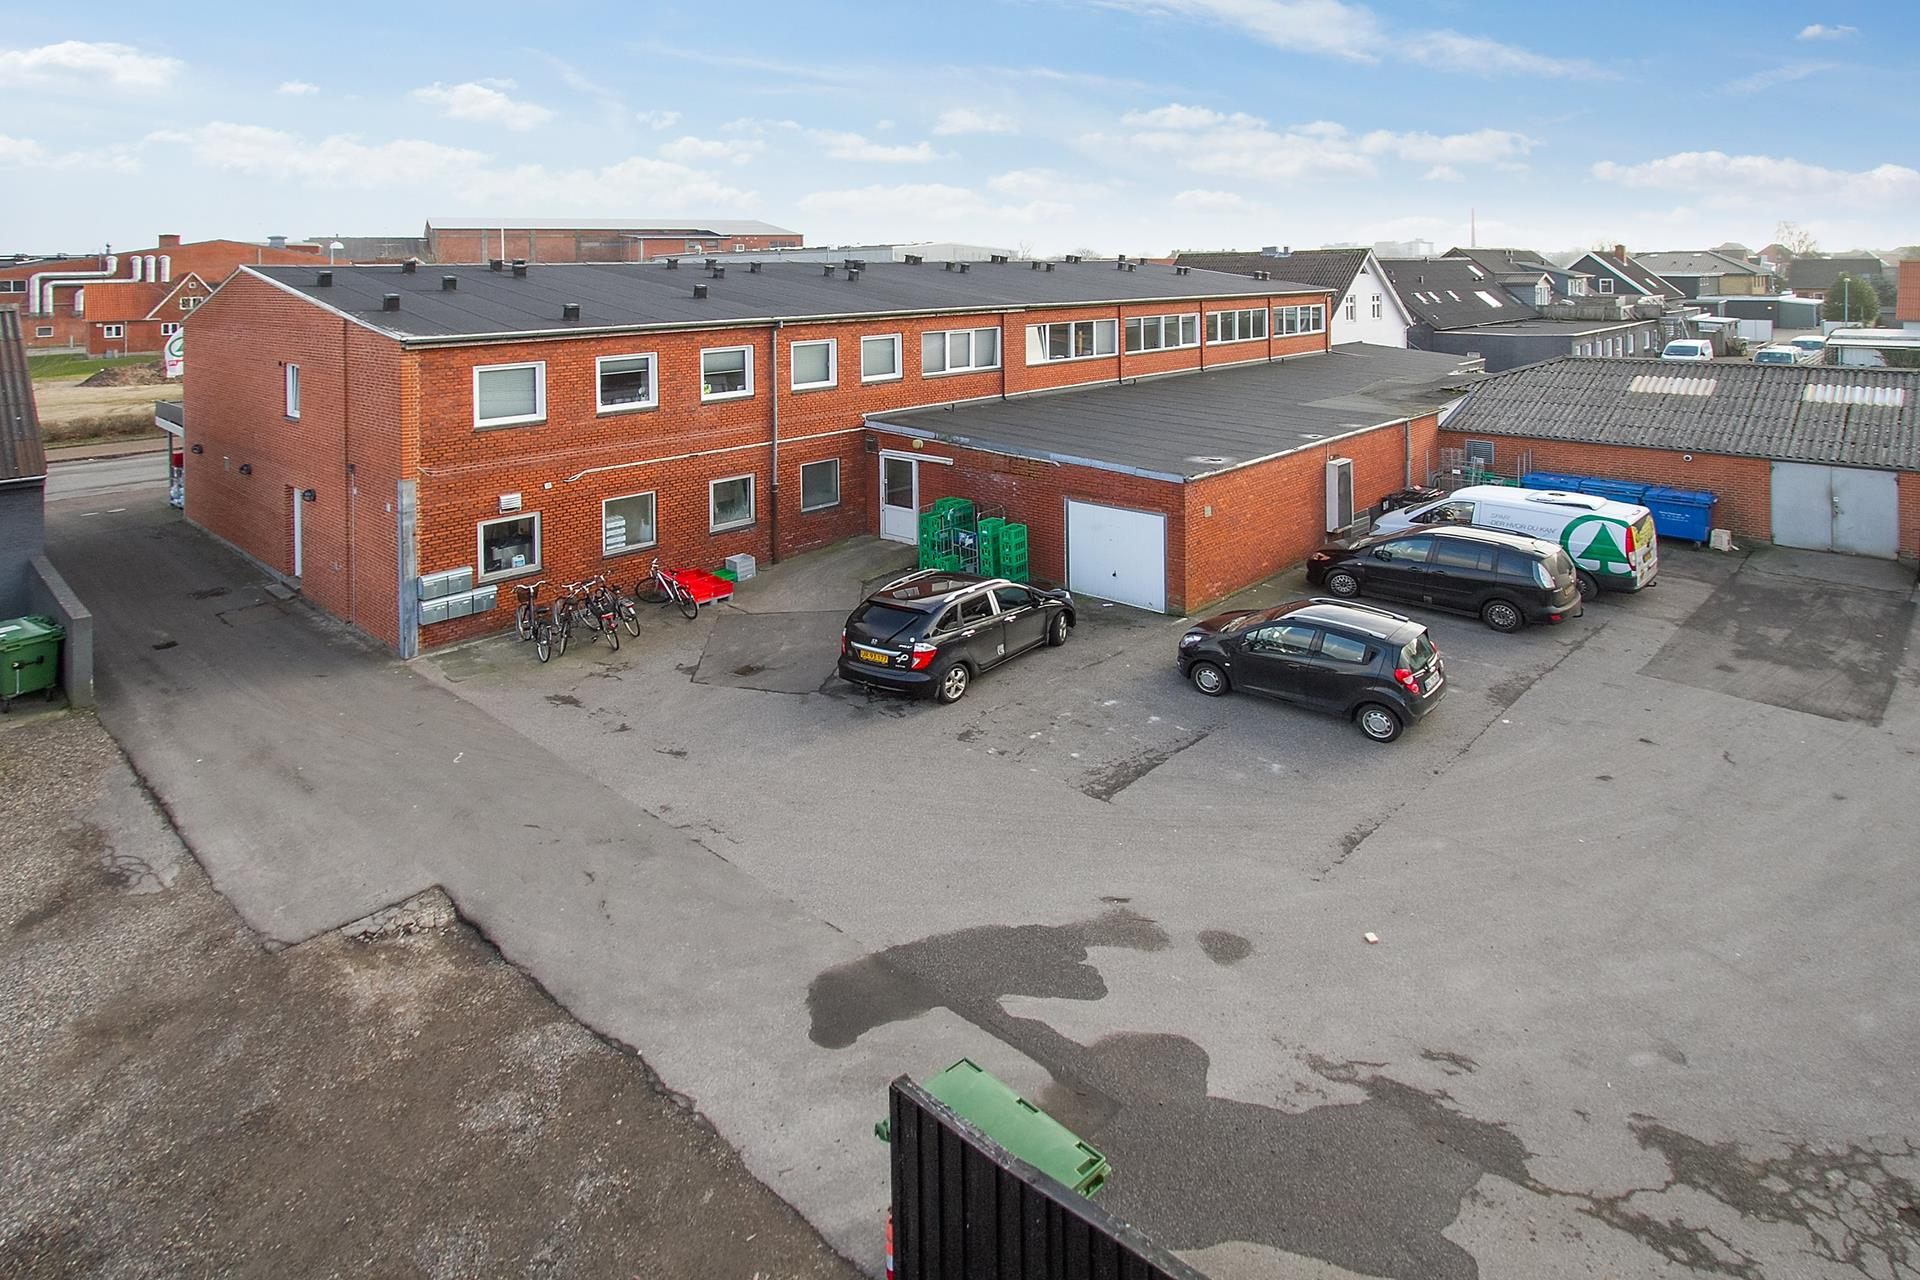 Bolig/erhverv på Struervej i Holstebro - Baggård